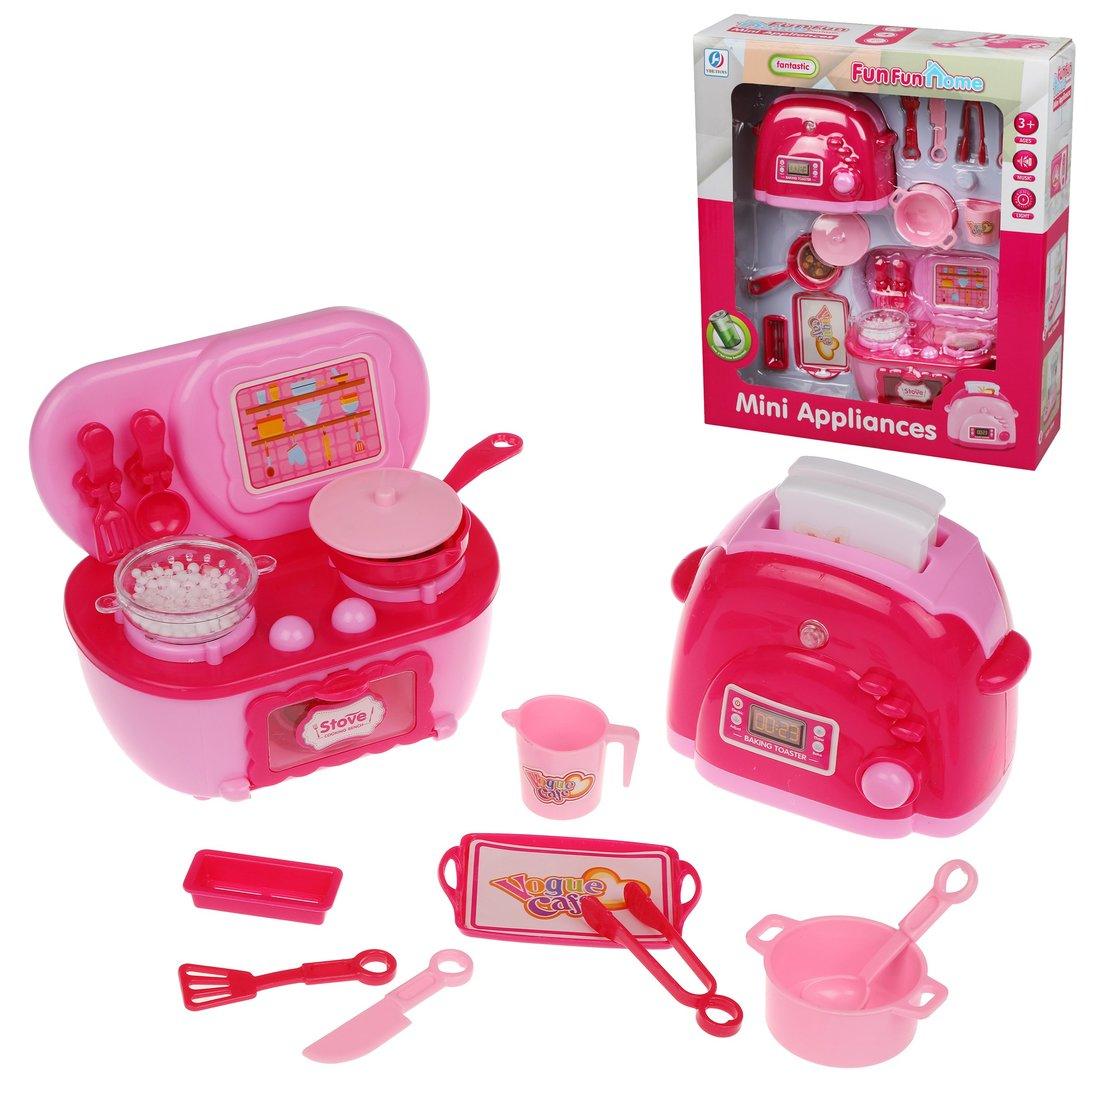 Кухонная техника Наша Игрушка плита, тостер, 16 предметов, свет, звук, коробка 200258801